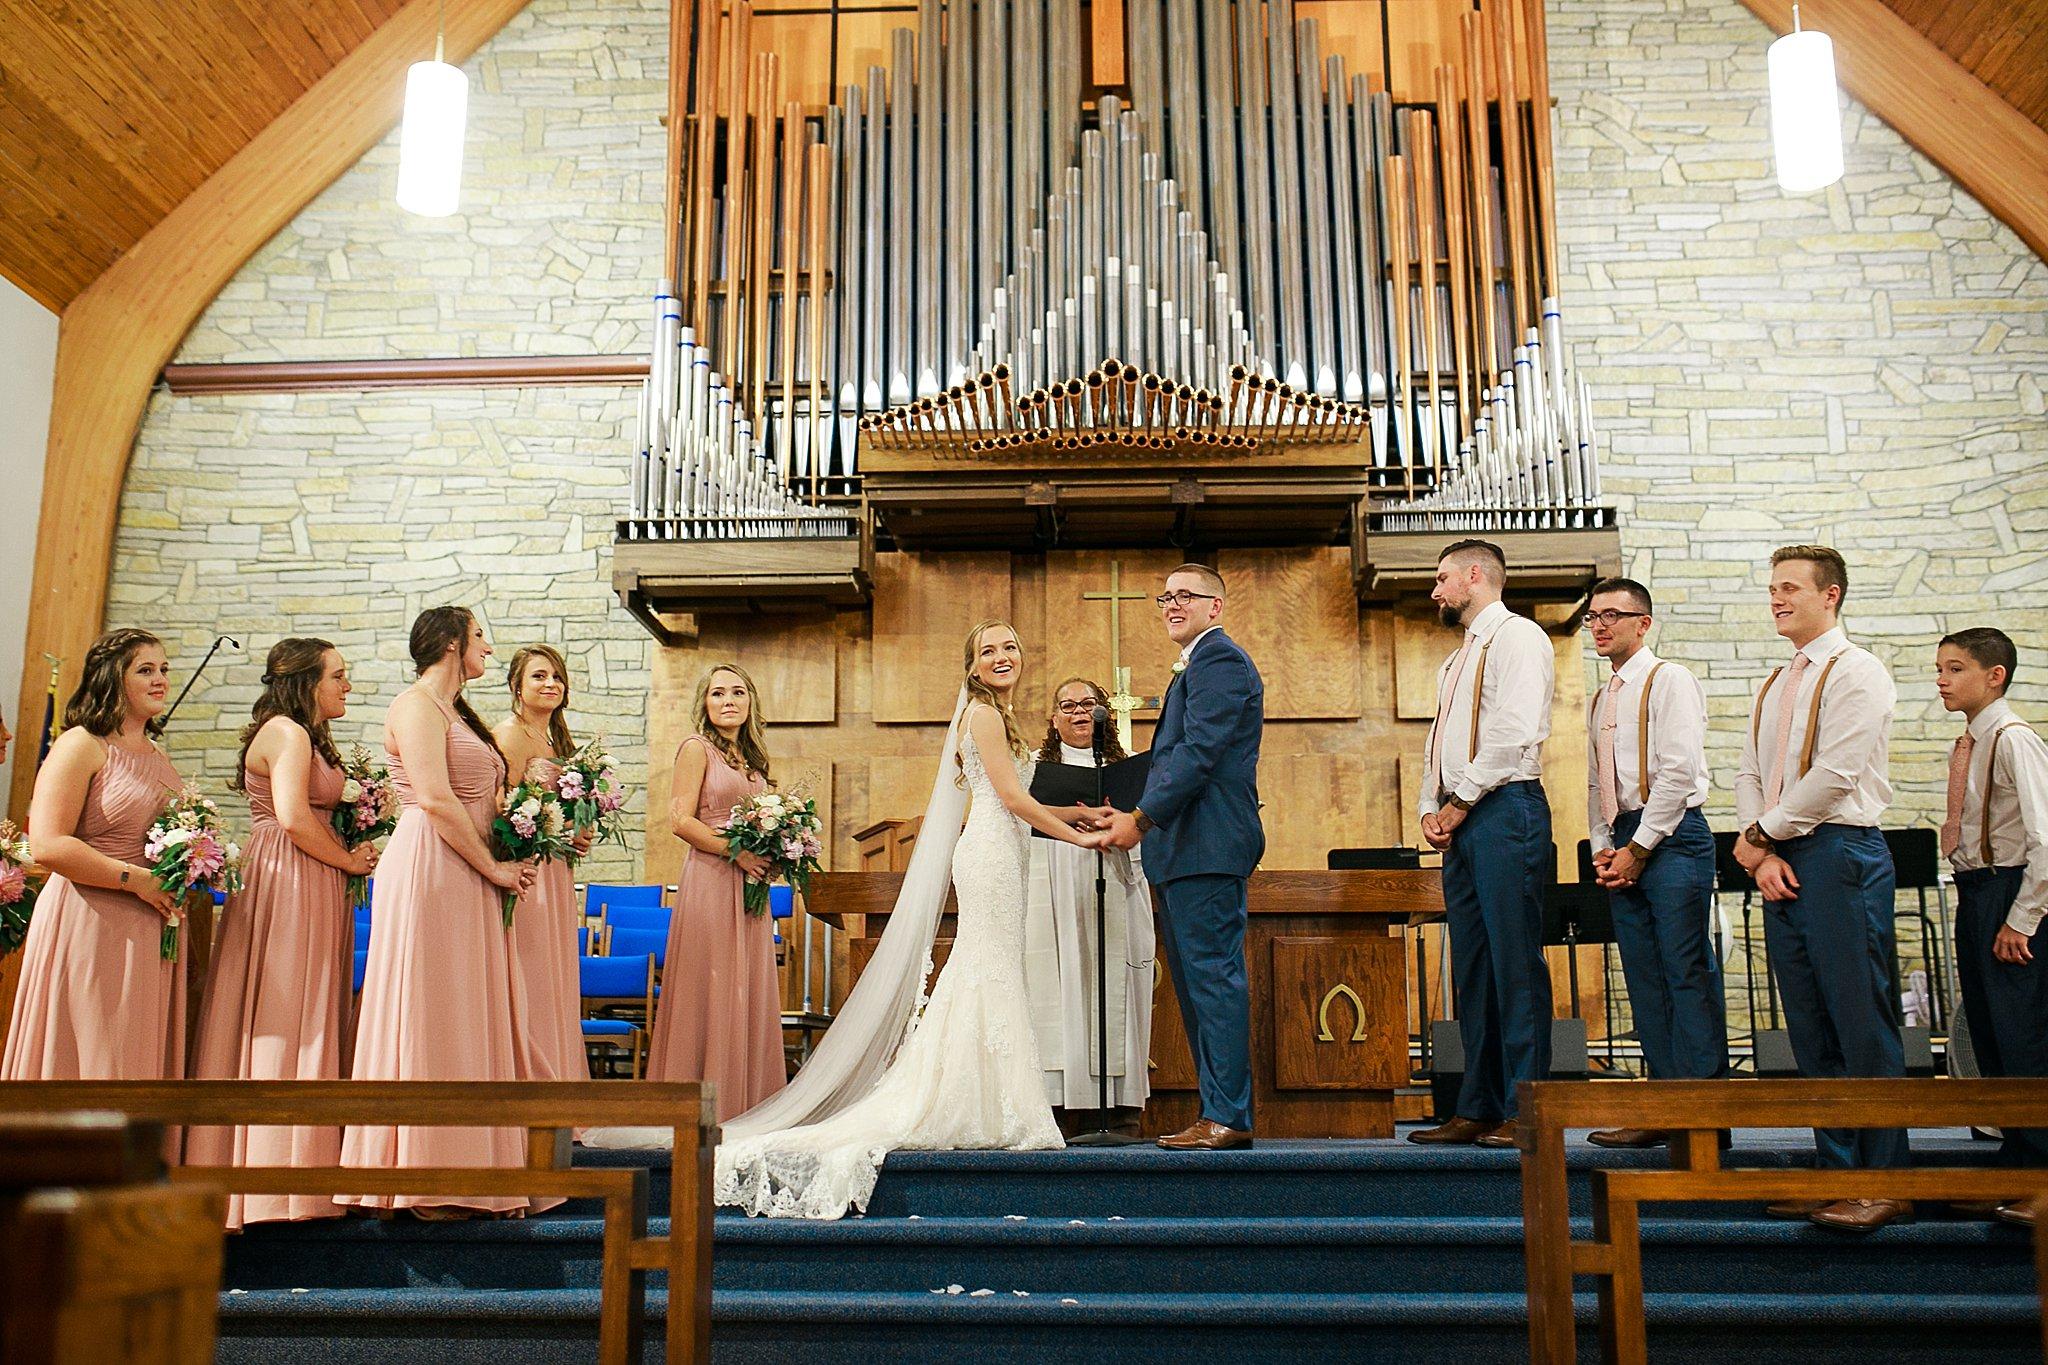 Preston Barn Old Drovers Inn Wedding Rustic Wedding Hudson Valley Photographer Sweet Alice Photography37.jpg